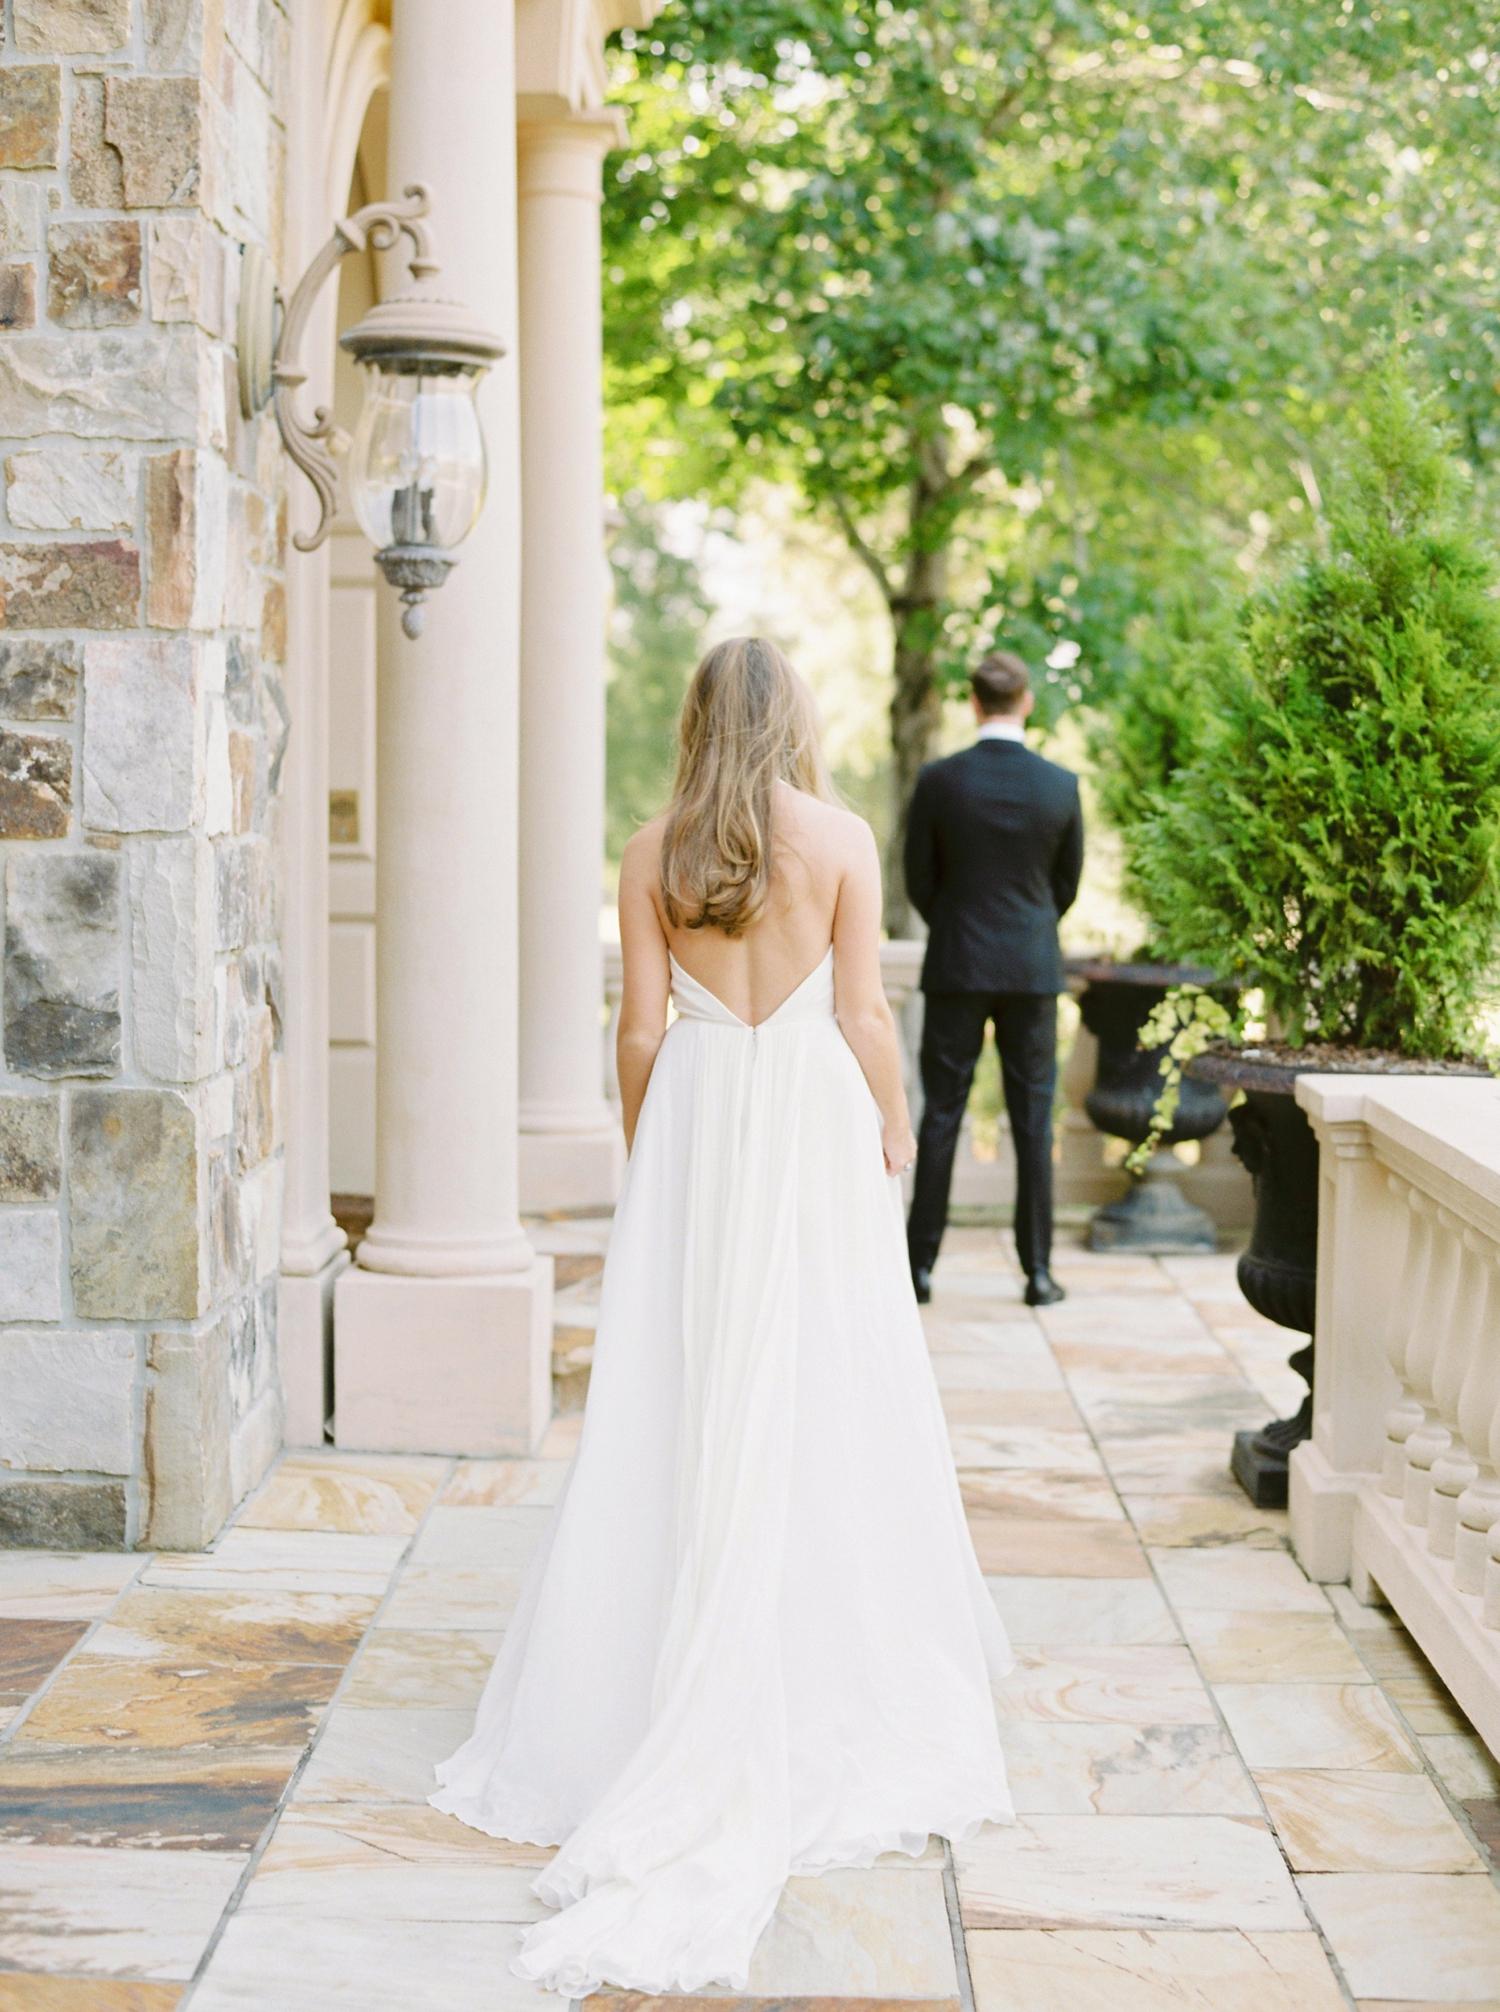 Calgary wedding photographers | georgia wedding photographers | fine art film | Justine Milton Photography | wedding details | georgia wedding | wedding ceremony